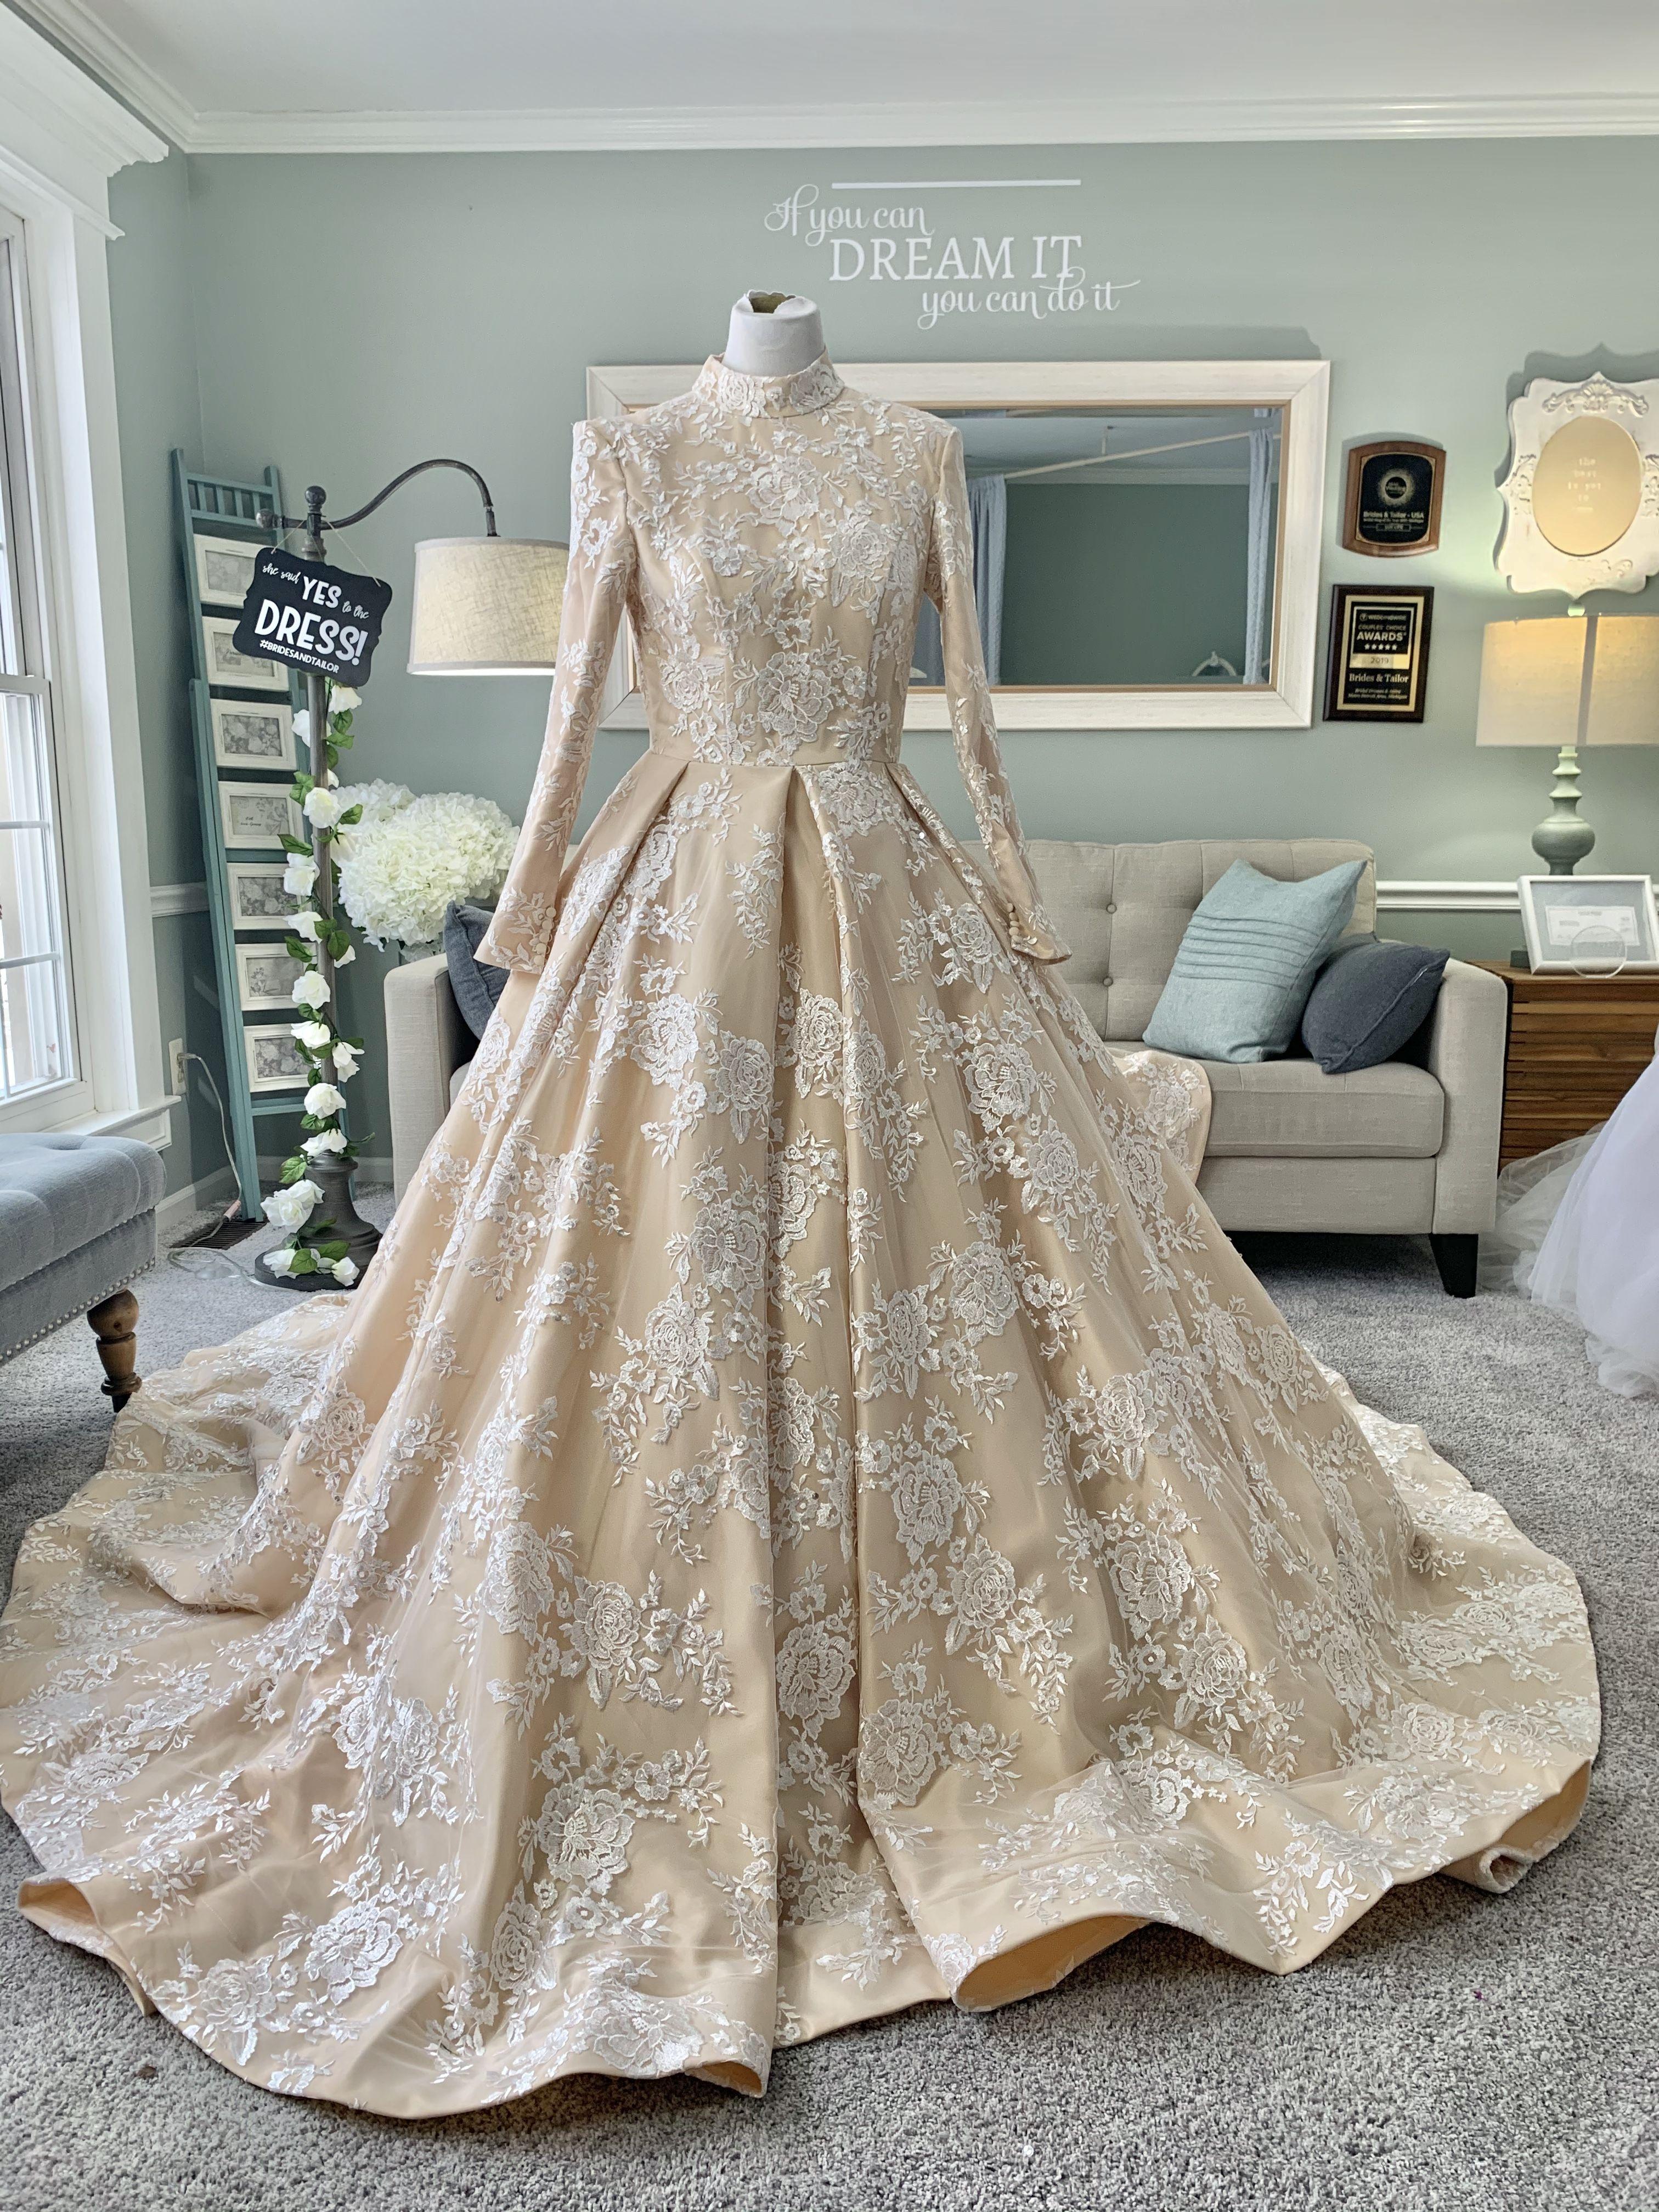 Custom Hijab Wedding Dress By Brides Tailor Brides Tailor Custom Hijab Wedding Dress By Brides Tailor In 2020 Wedding Dress Sleeves Wedding Dress Long Sleeve Conservative Wedding Dress